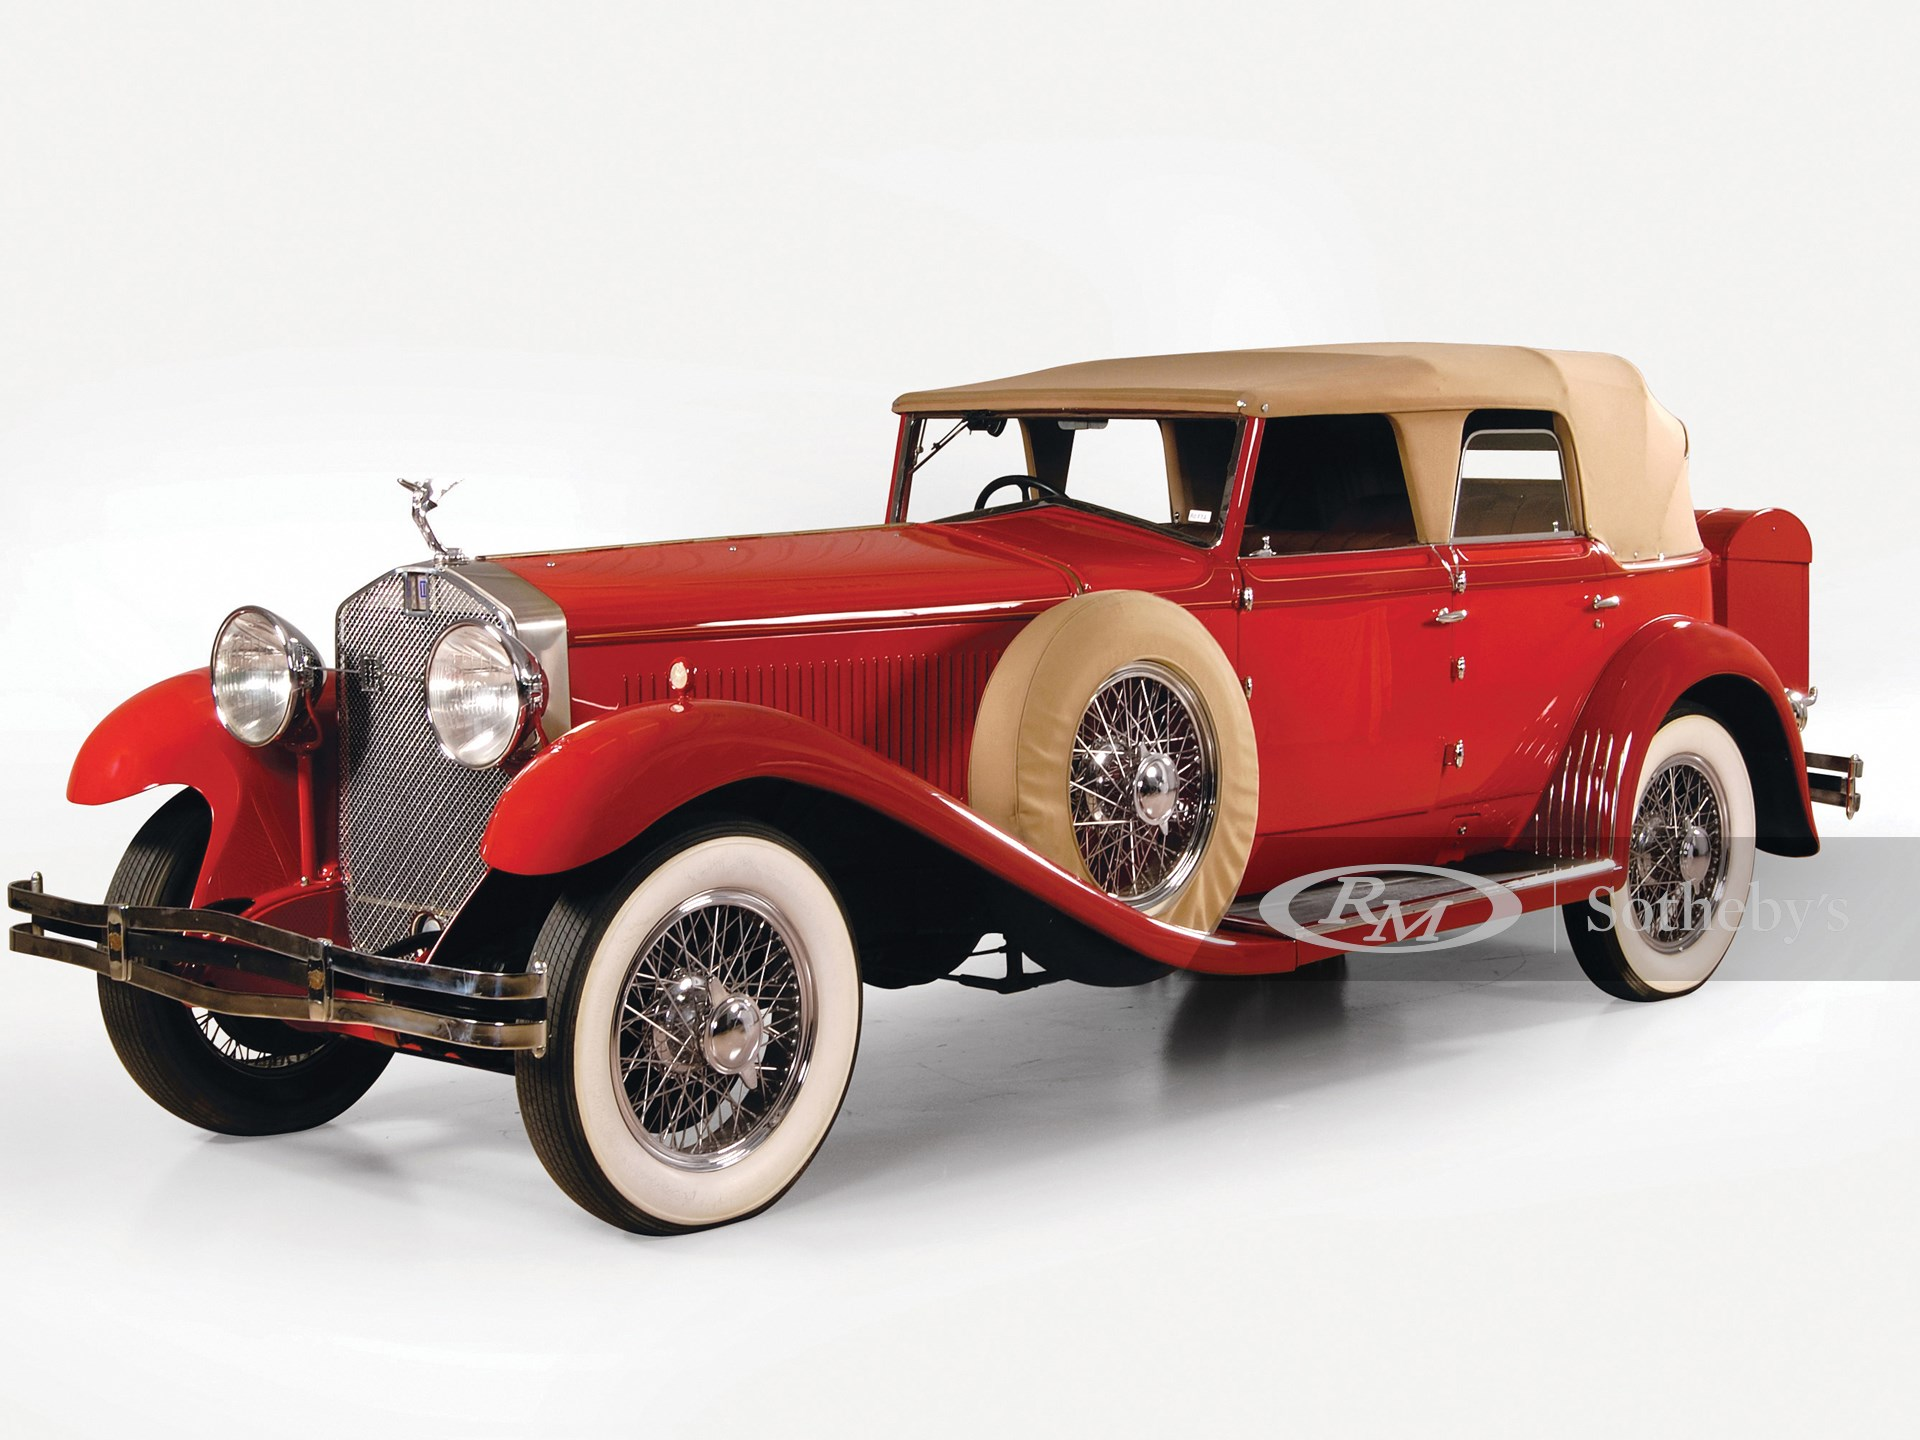 1930 Isotta-Fraschini 8A Convertible Sedan